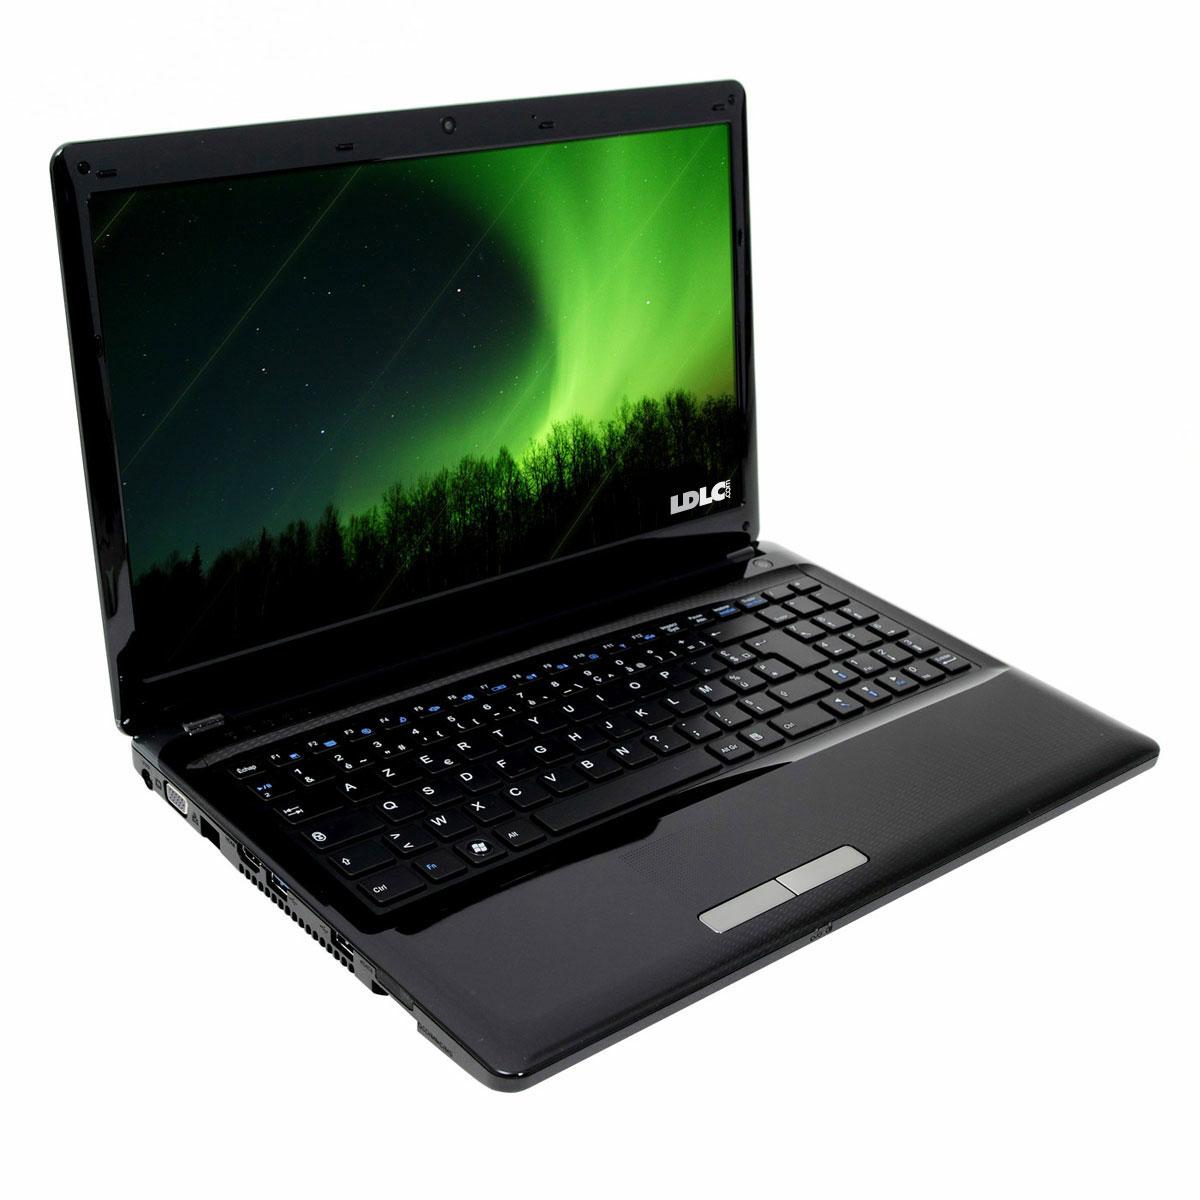 "PC portable LDLC Aurore BB4-I3-4-H6 Intel Core i3-2370M 4 Go 640 Go 15.6"" LED Graveur DVD Wi-Fi N/Bluetooth Webcam (sans OS)"